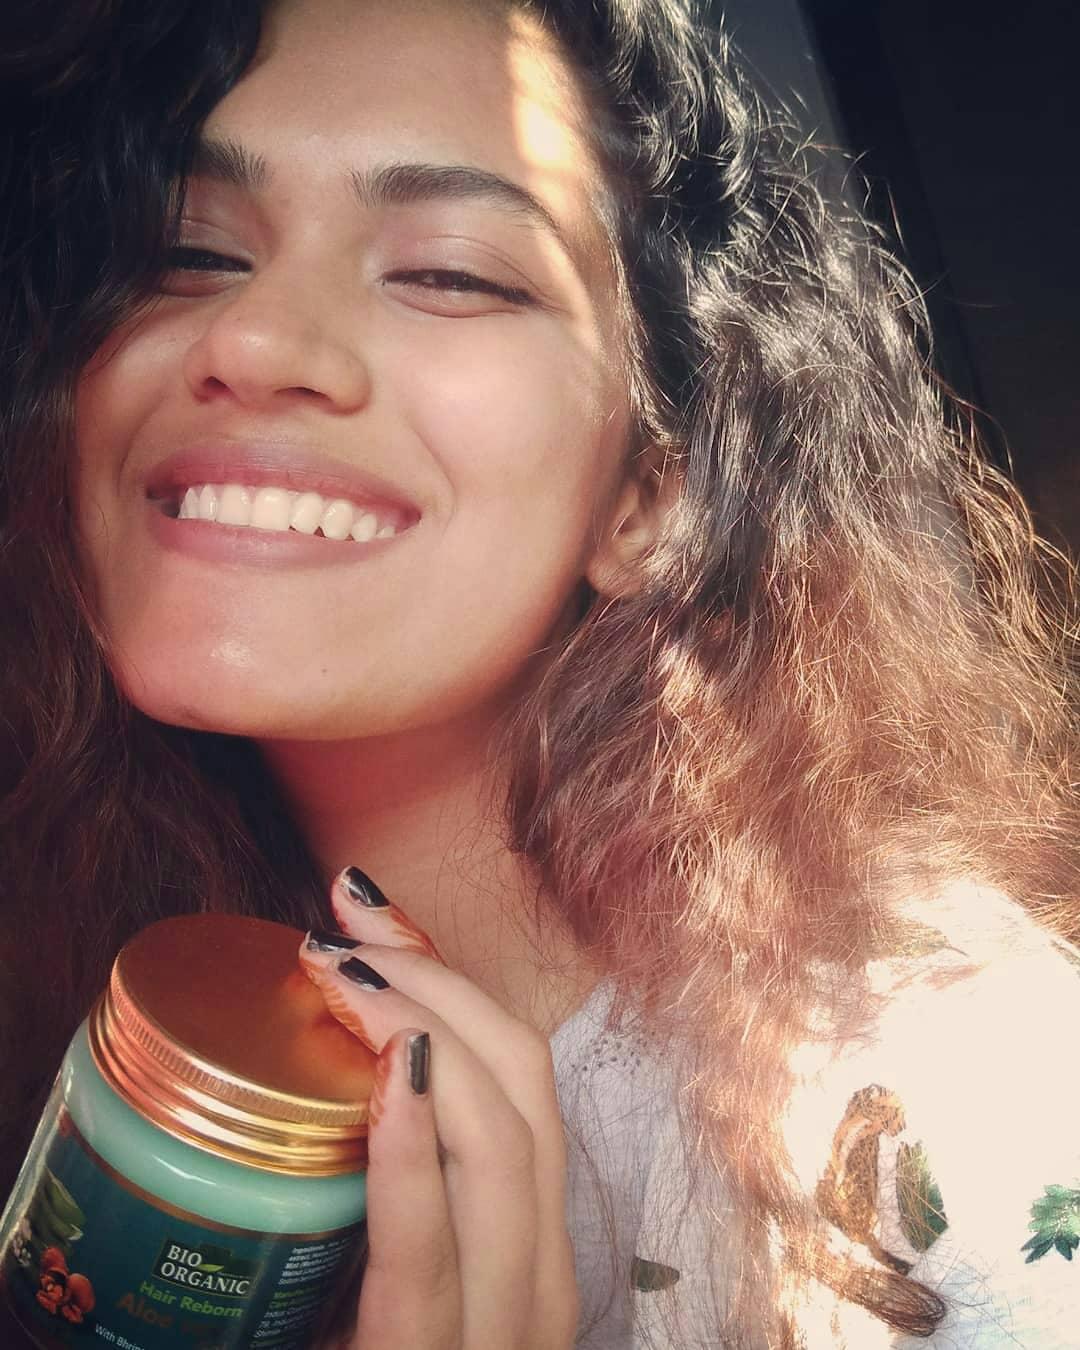 Indus Valley Bio Organic Hair Reborn Aloe Vera Gel With Bhringraj & Walnut Oil For Ultimate Hair Management-Love it!-By iyermahima-1